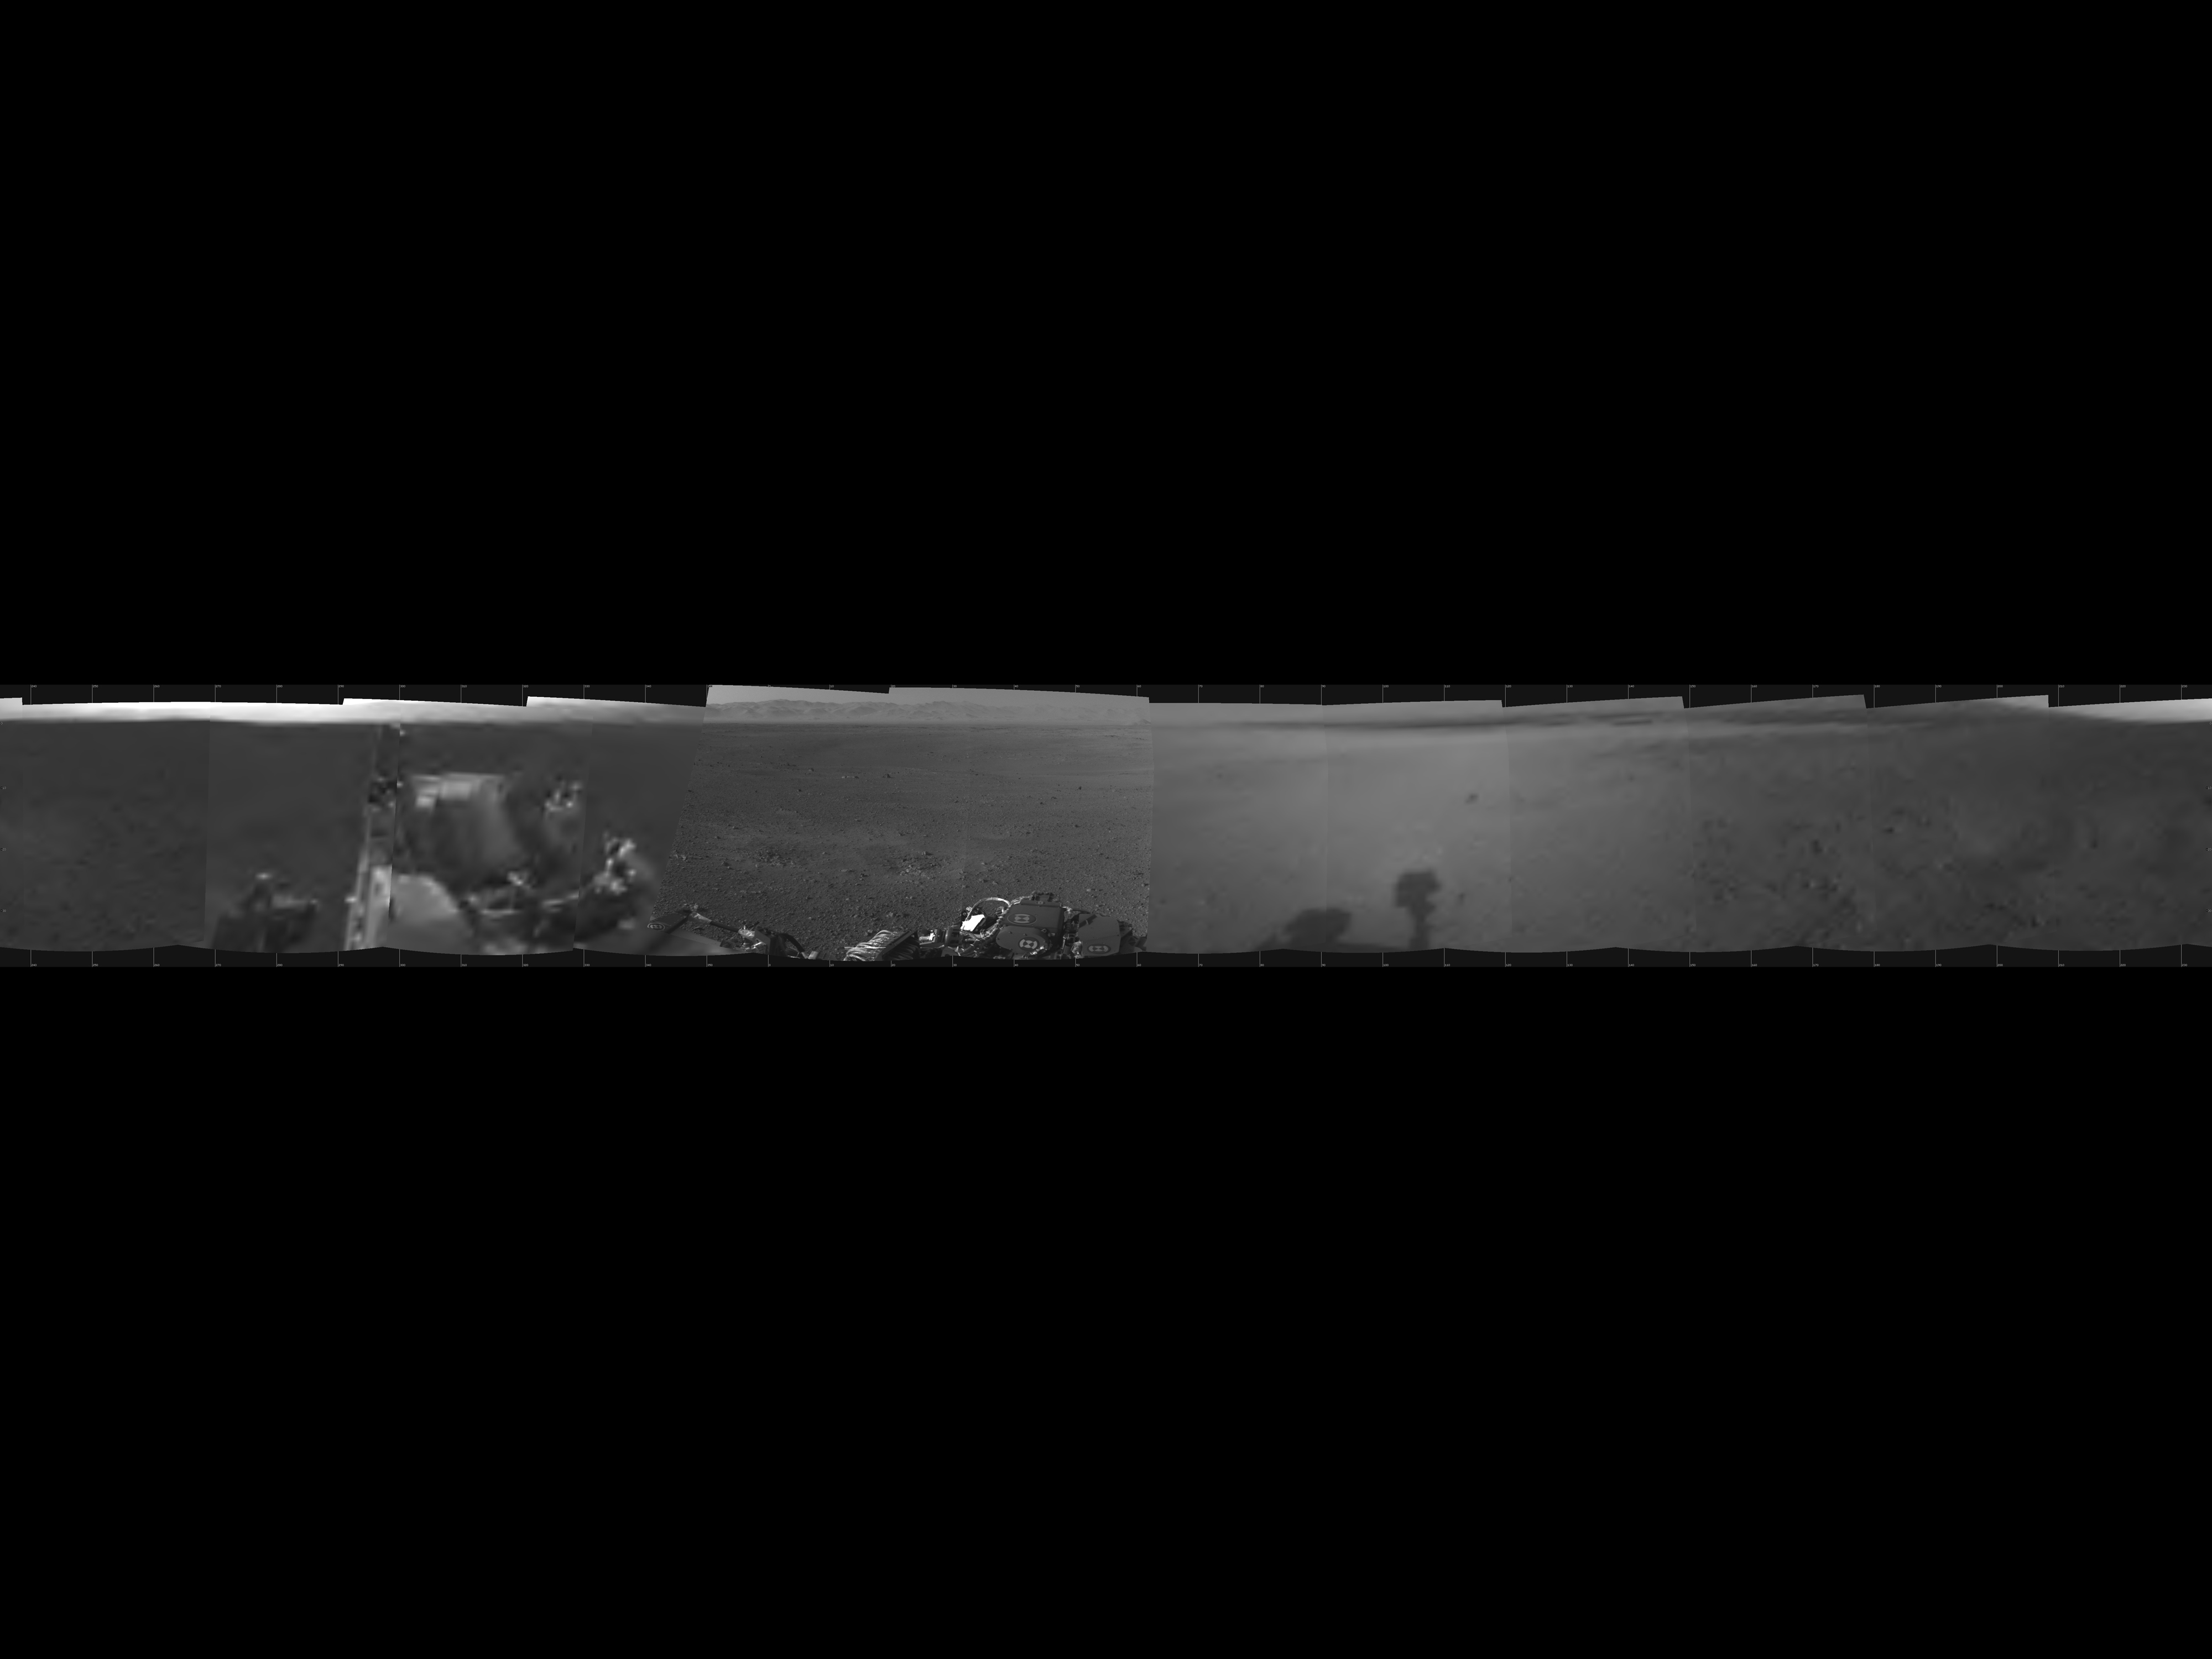 Mars Rover Curiosity's 1st Panorama